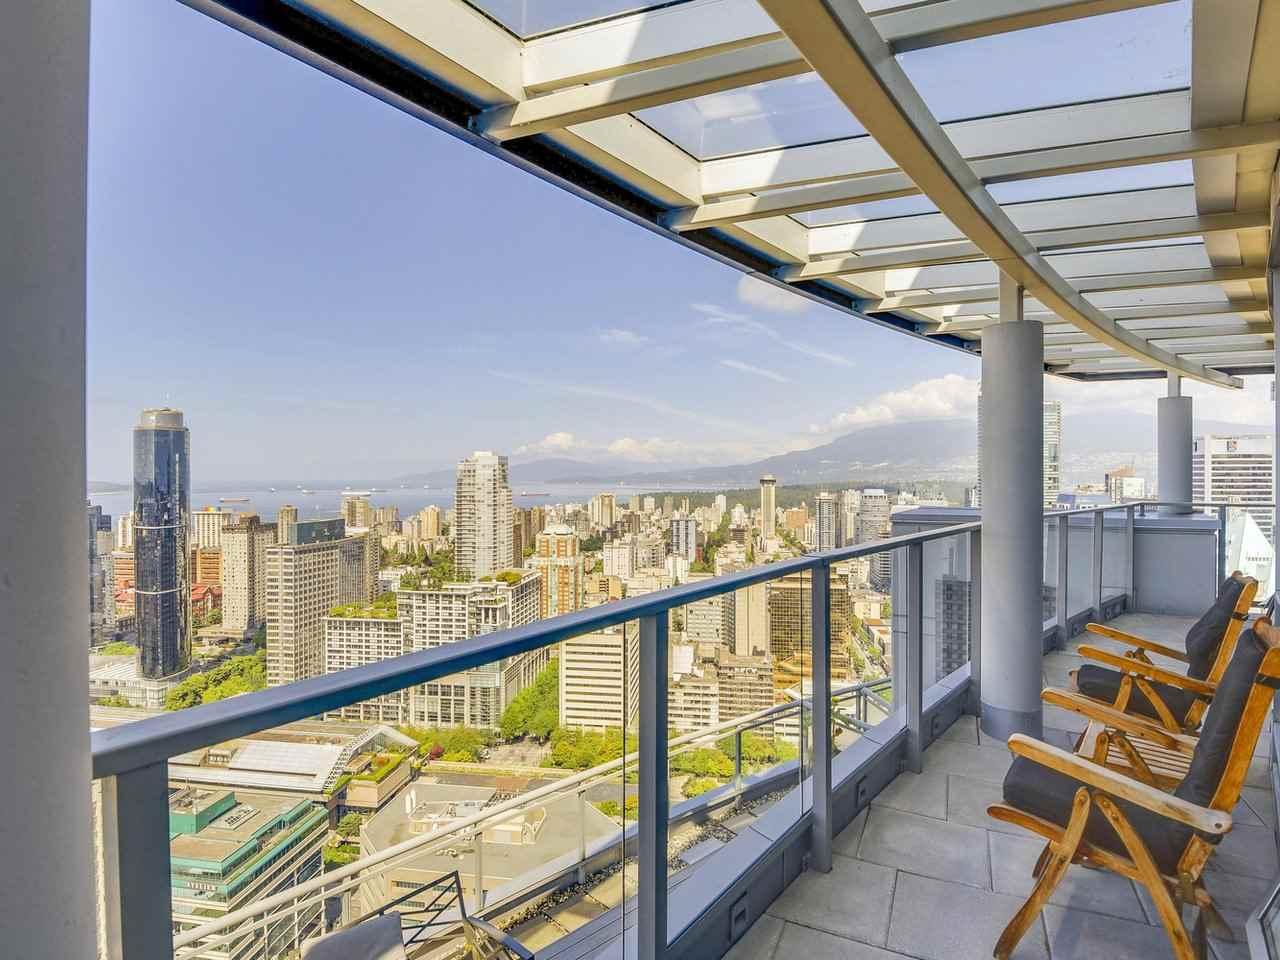 Condo Apartment at PH3 833 SEYMOUR STREET, Unit PH3, Vancouver West, British Columbia. Image 17